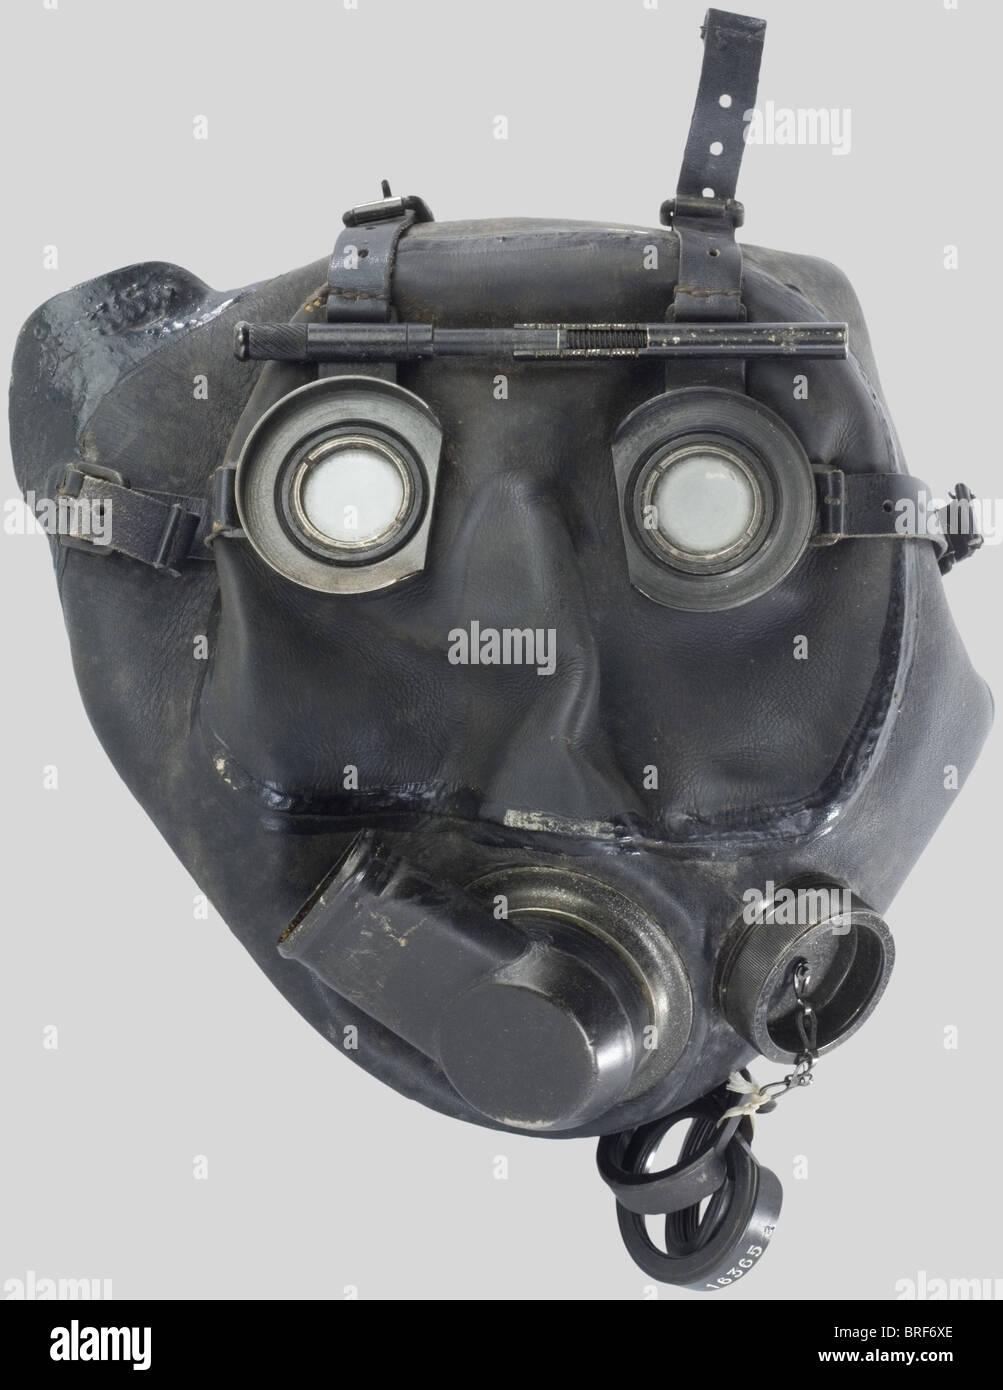 masque respiratoire oxygene